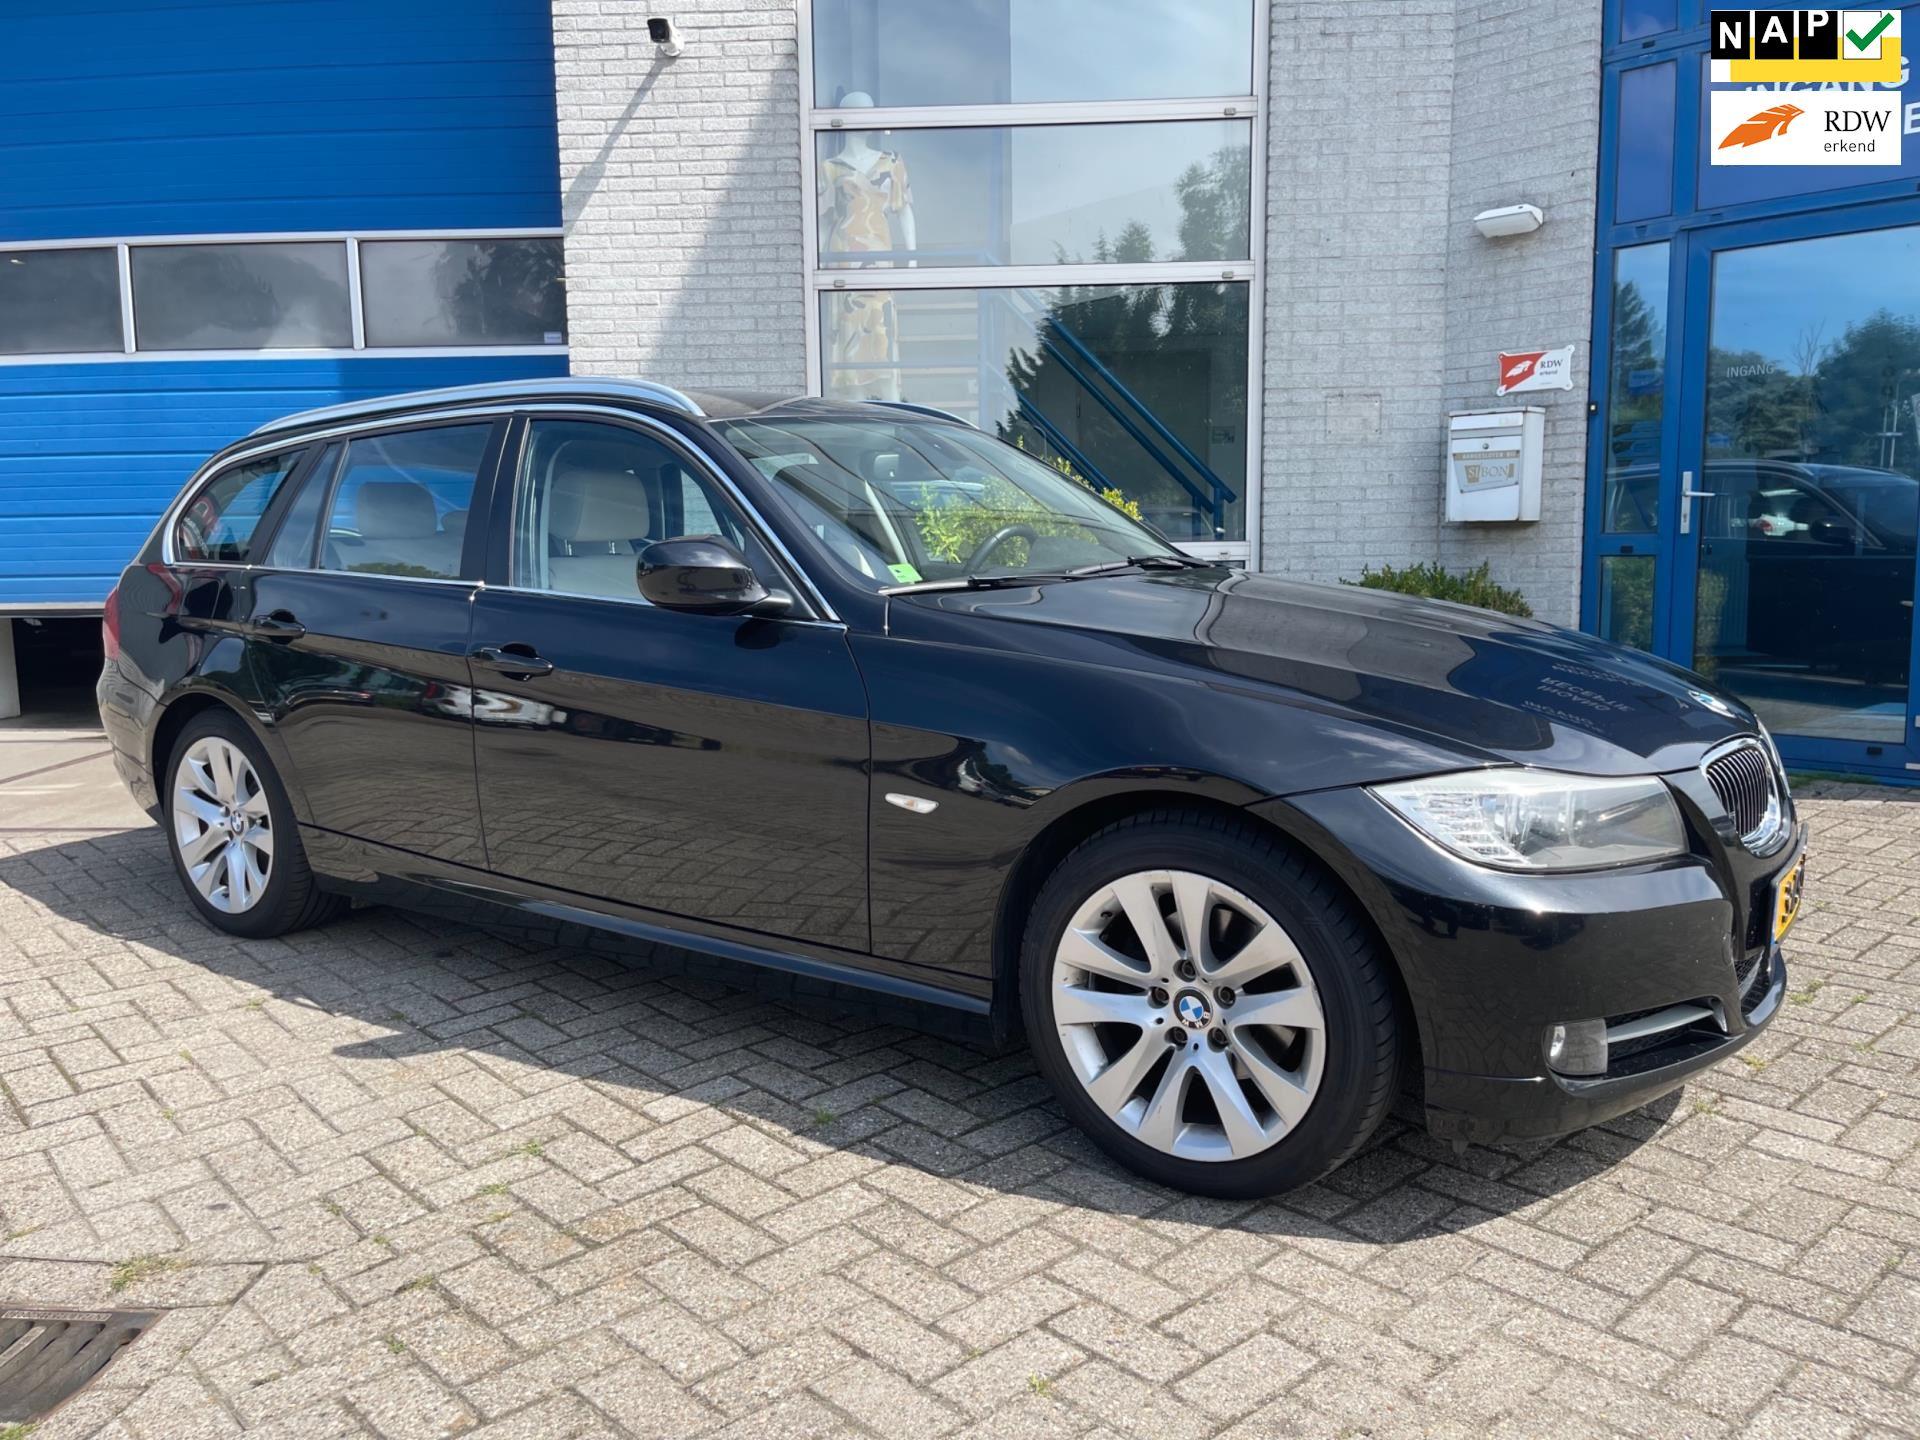 BMW 3-serie Touring occasion - Autocentrum Zaanstad